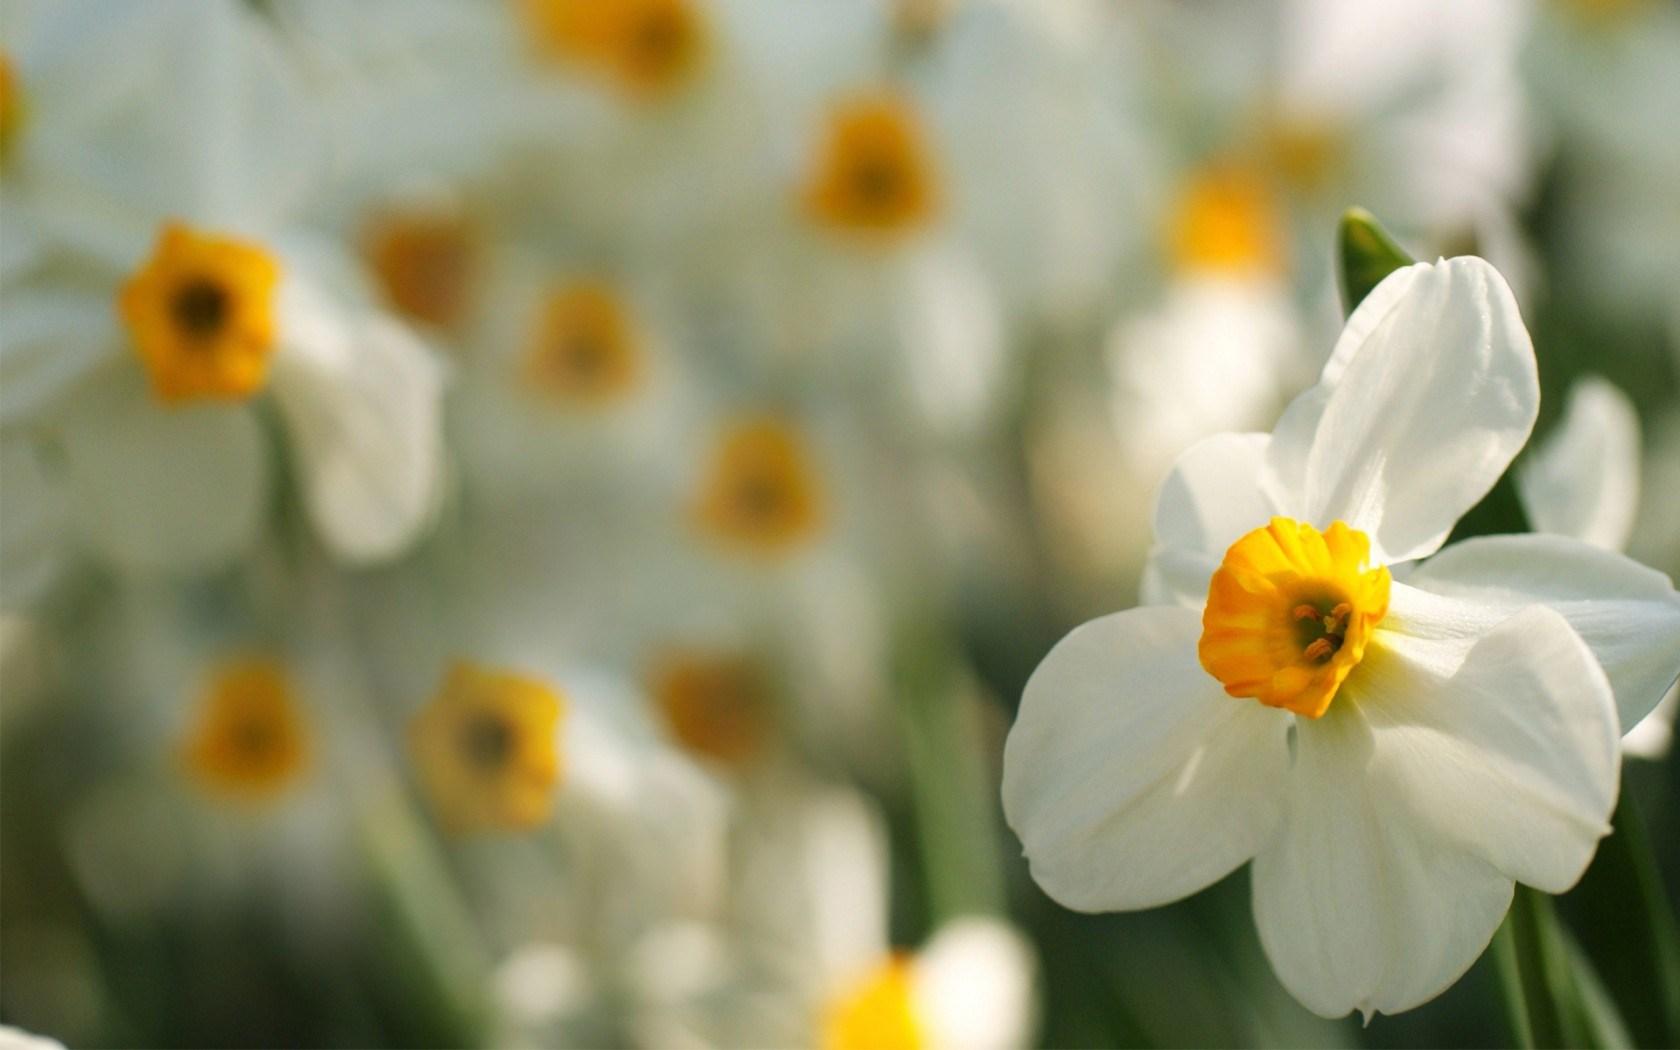 daffodils flowers macro wallpaper | 1680x1050 | #22766